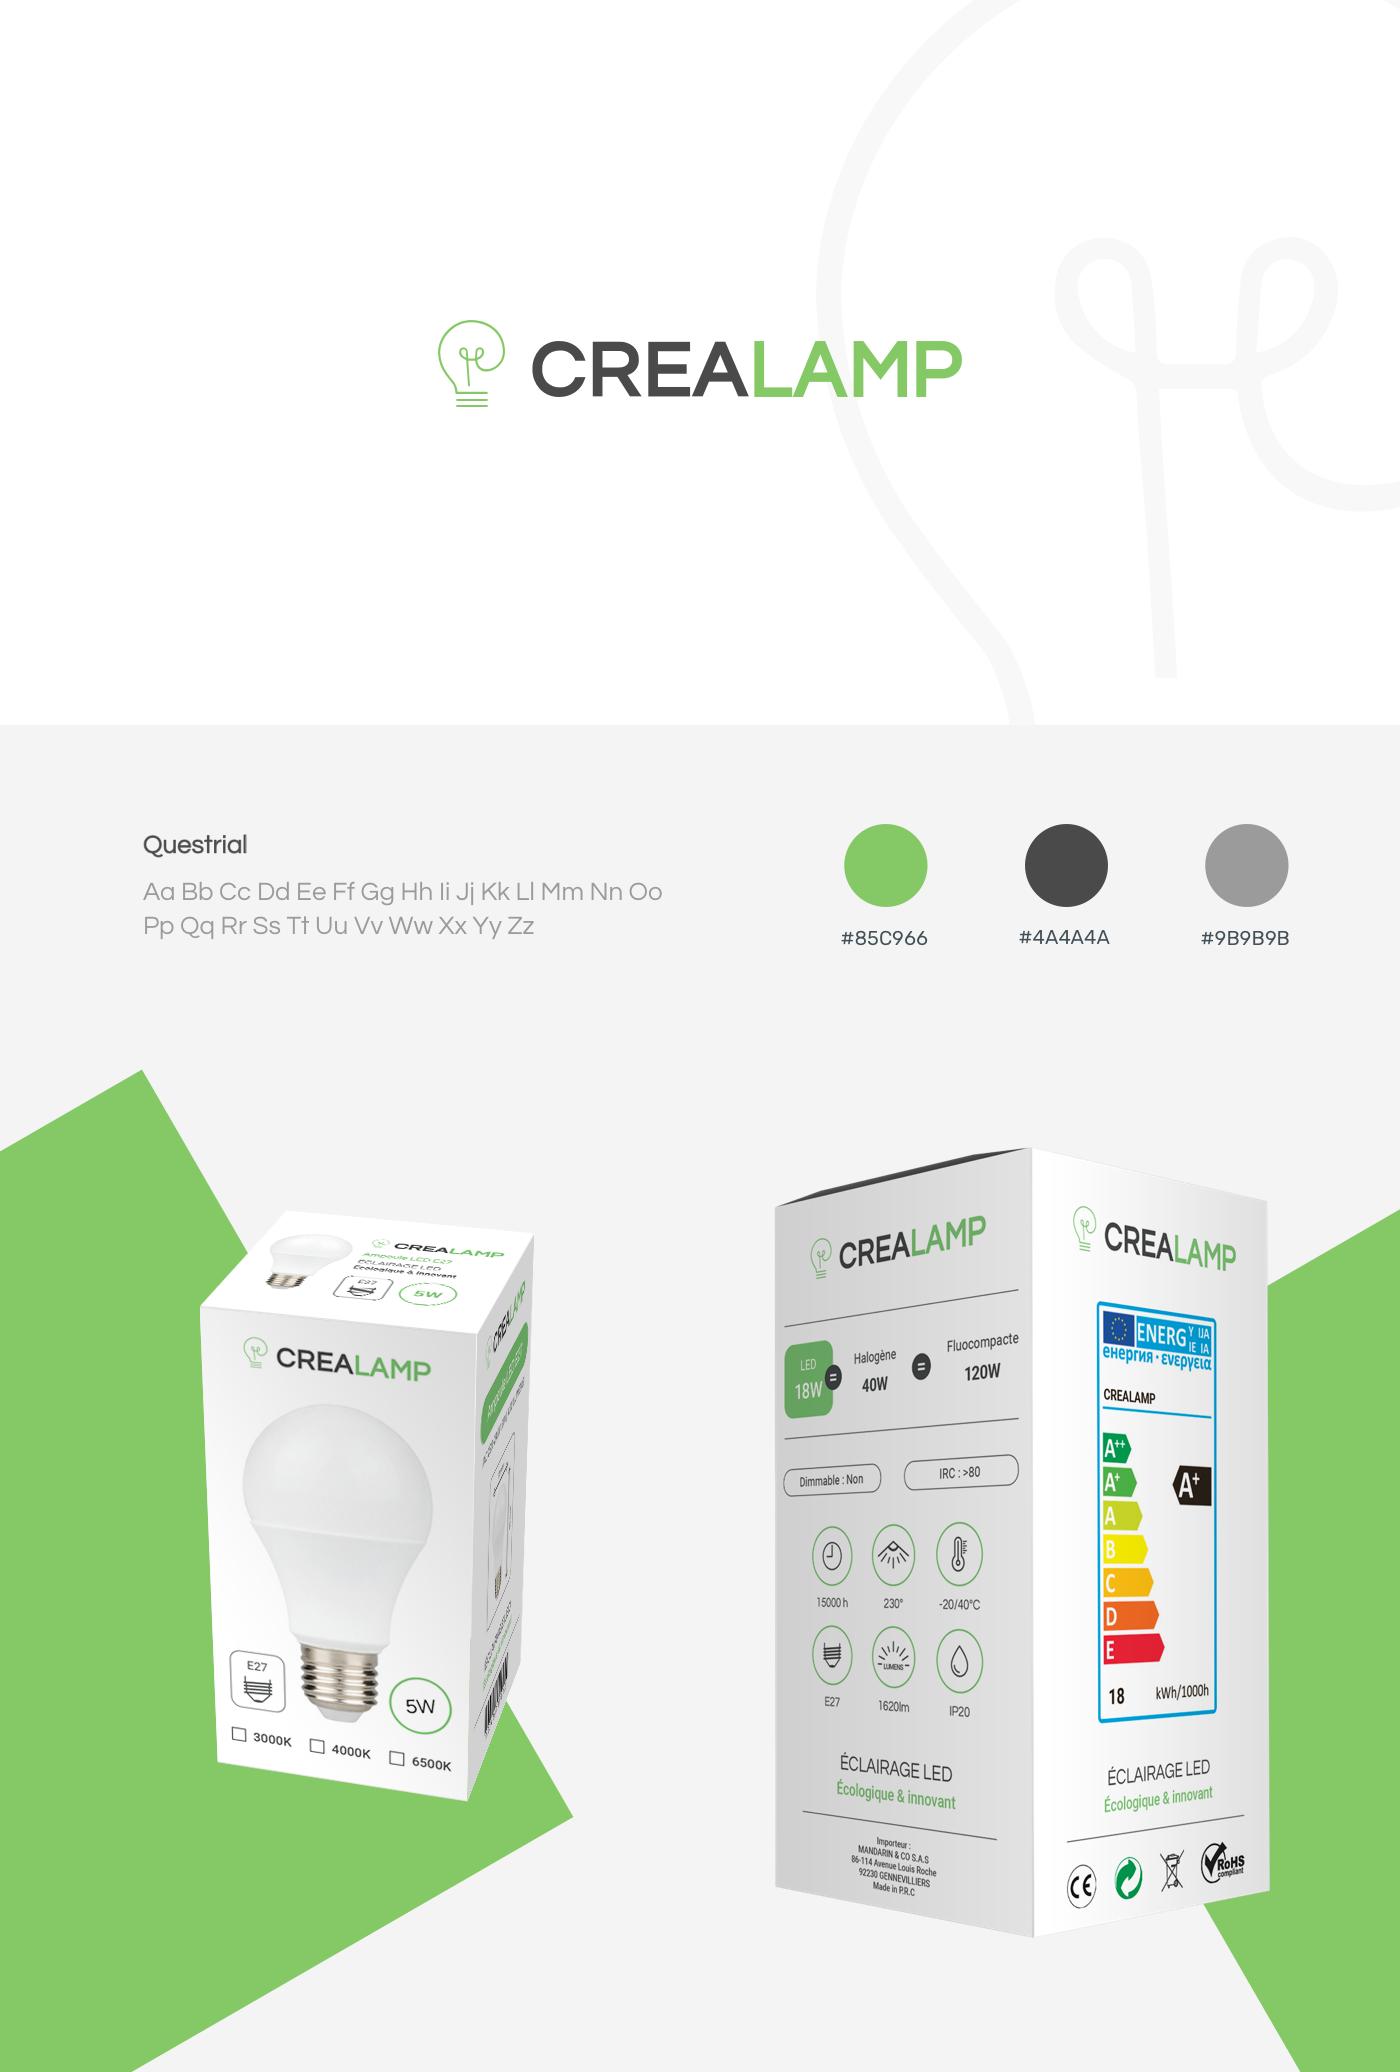 Crealamp project